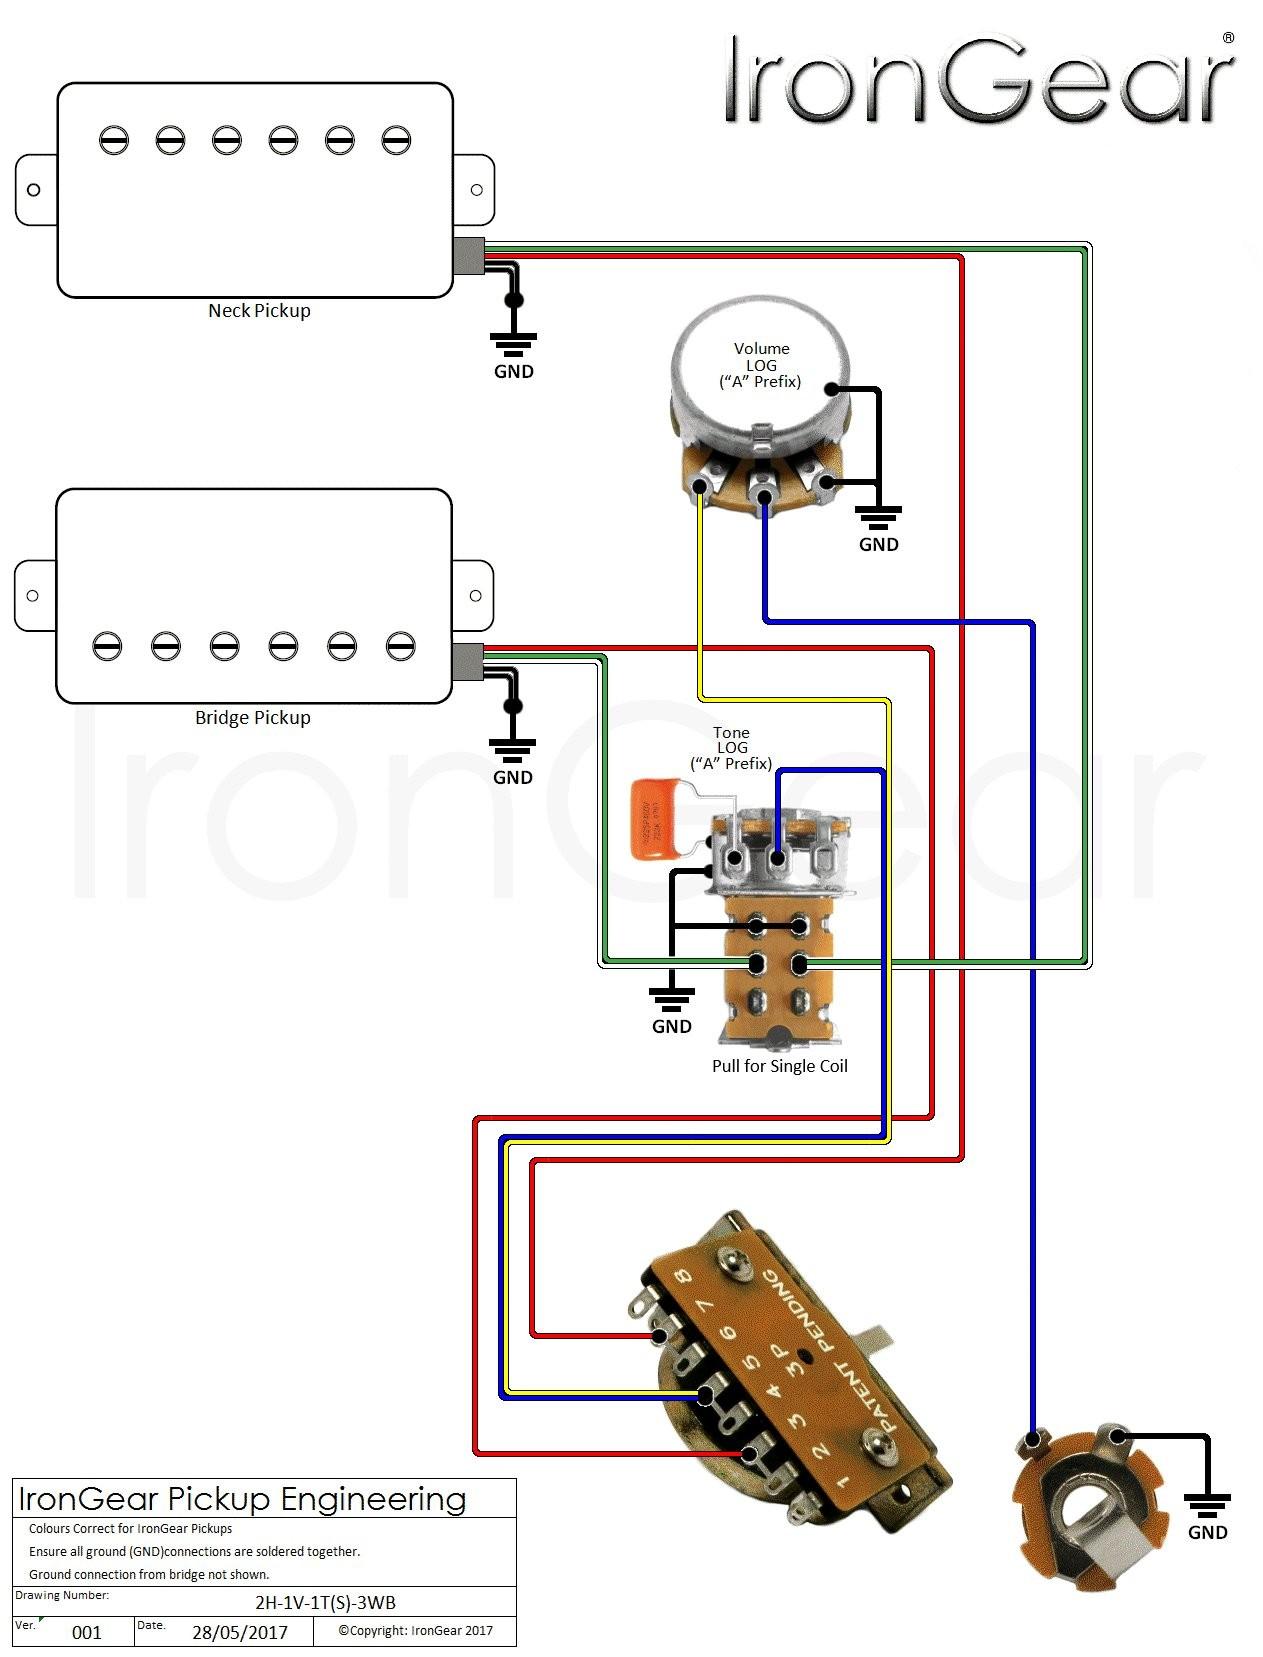 Emg Hz Wiring Diagram Awesome Three Humbucker Wiring Diagram Copy Irongear Pickups Wiring Emg Hz